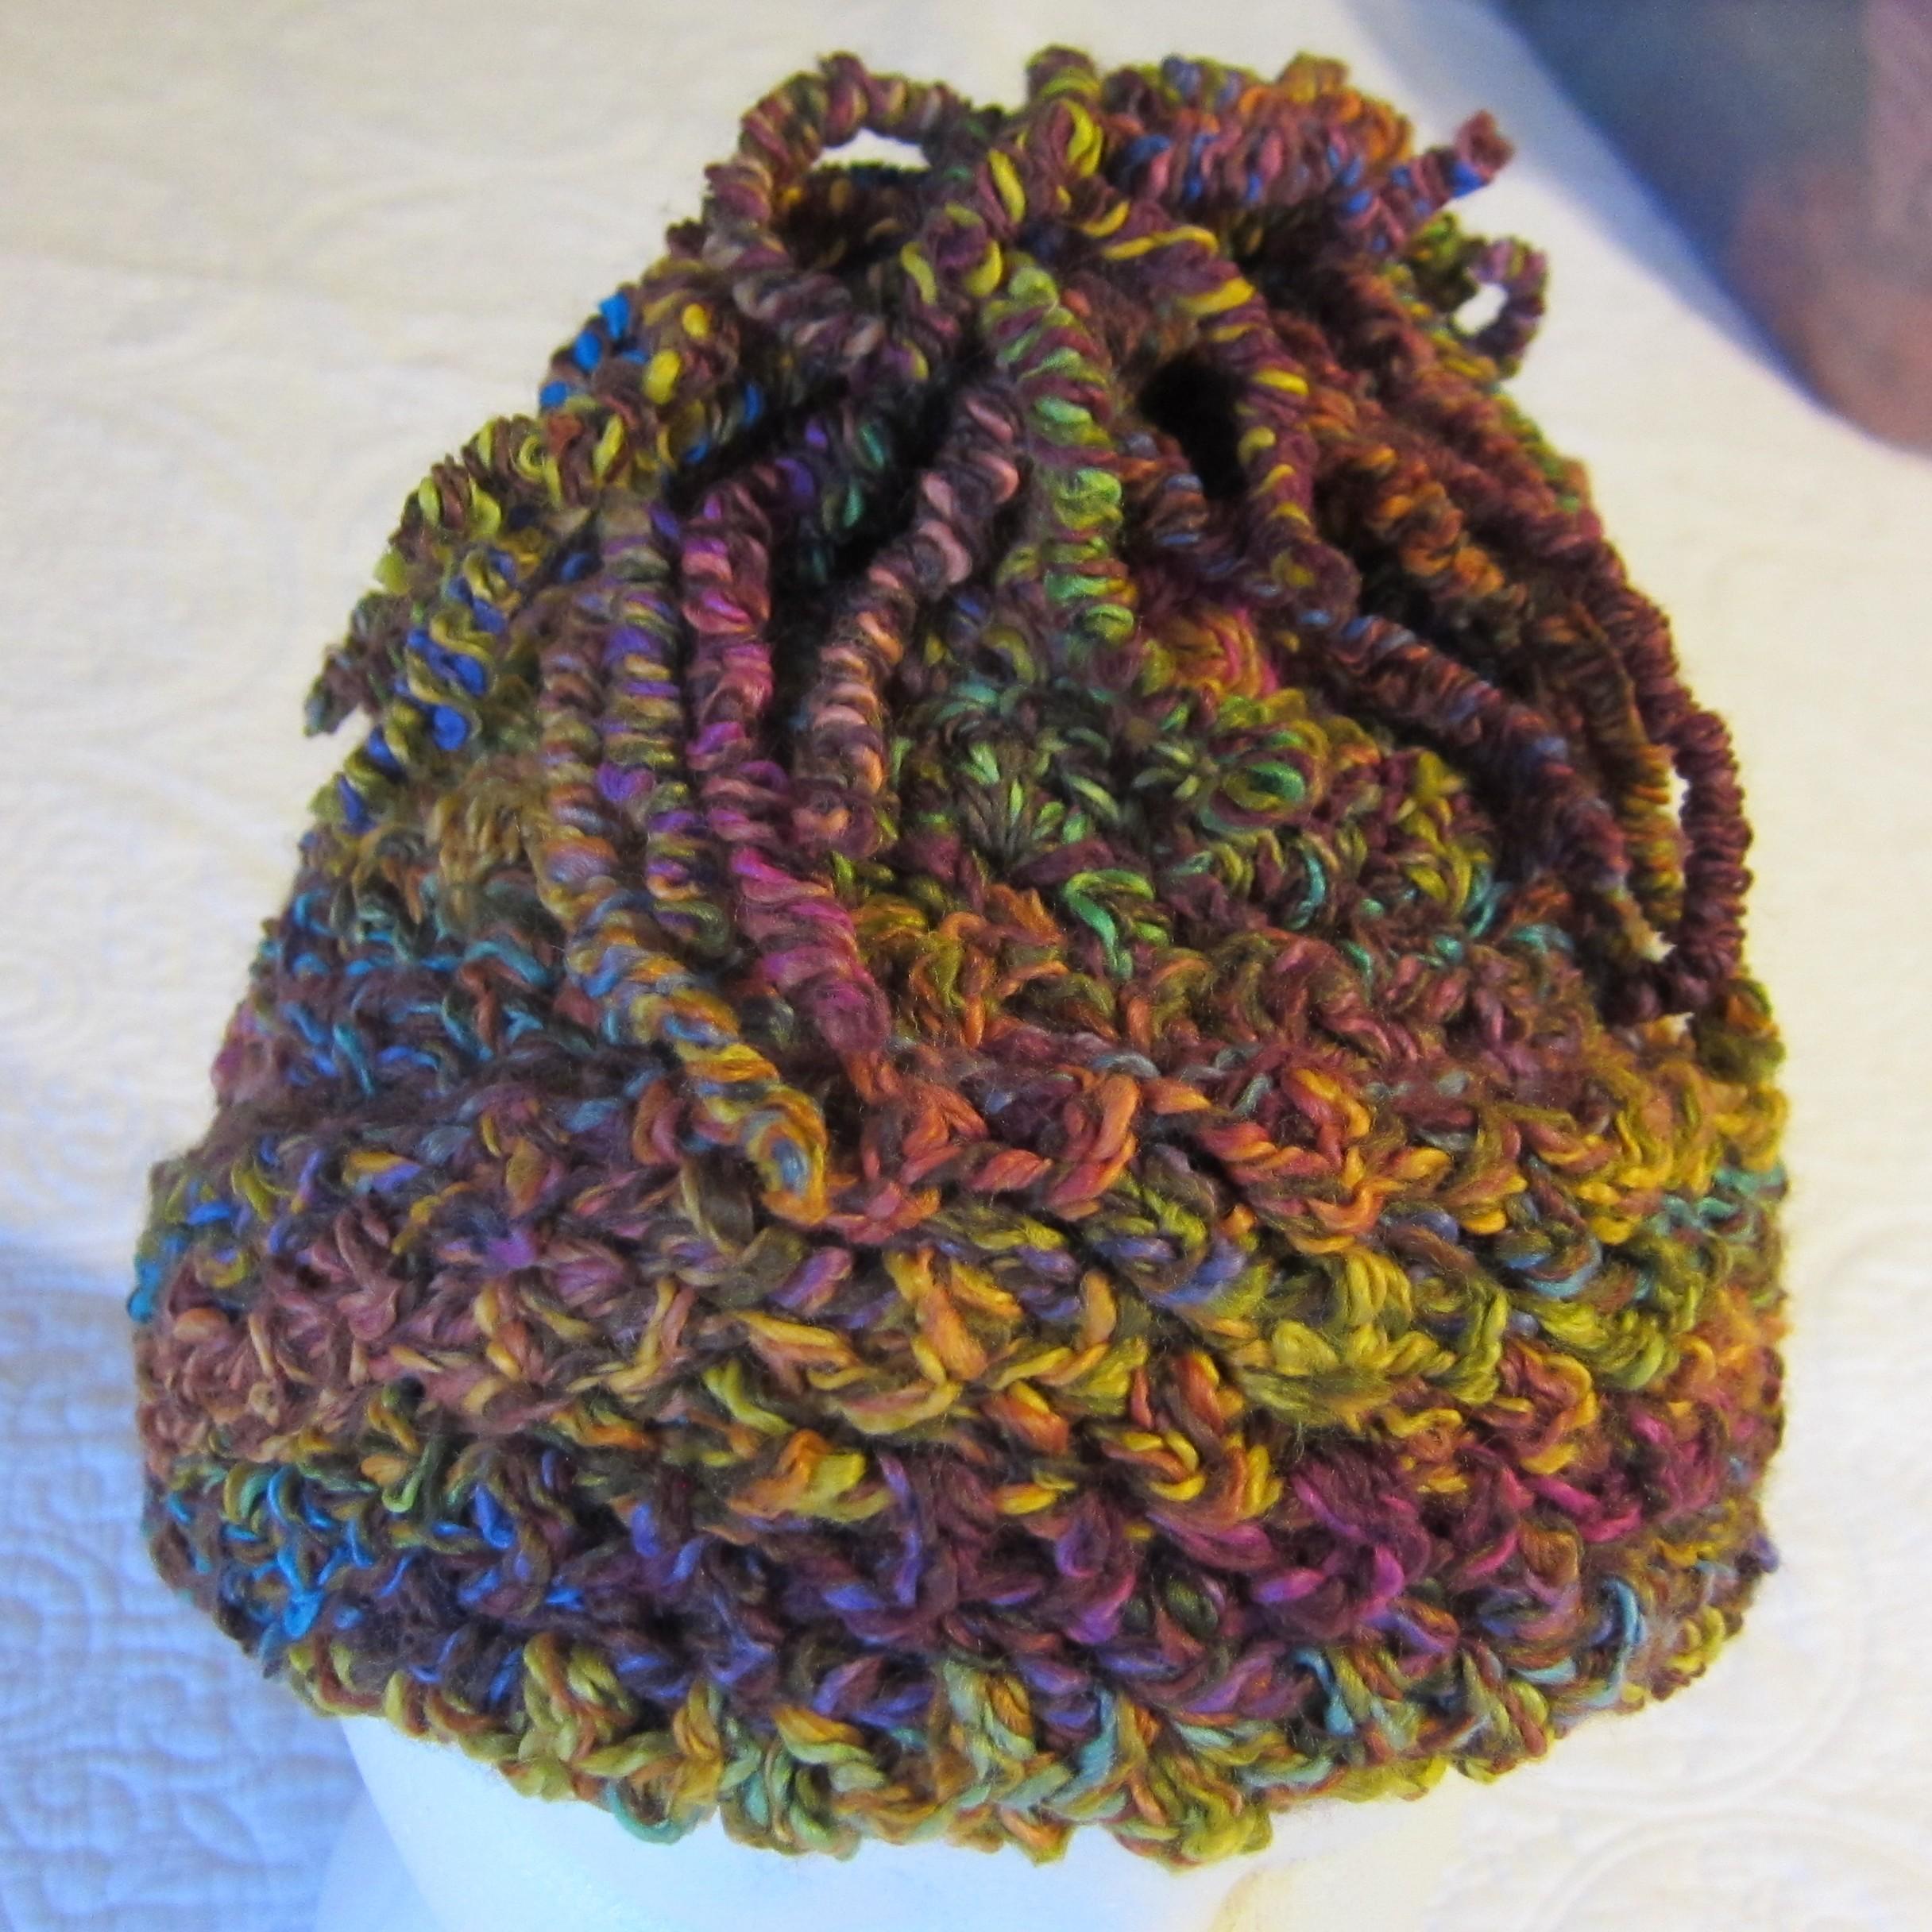 Alfa img - Showing > Yarn Multi Colored Crochet